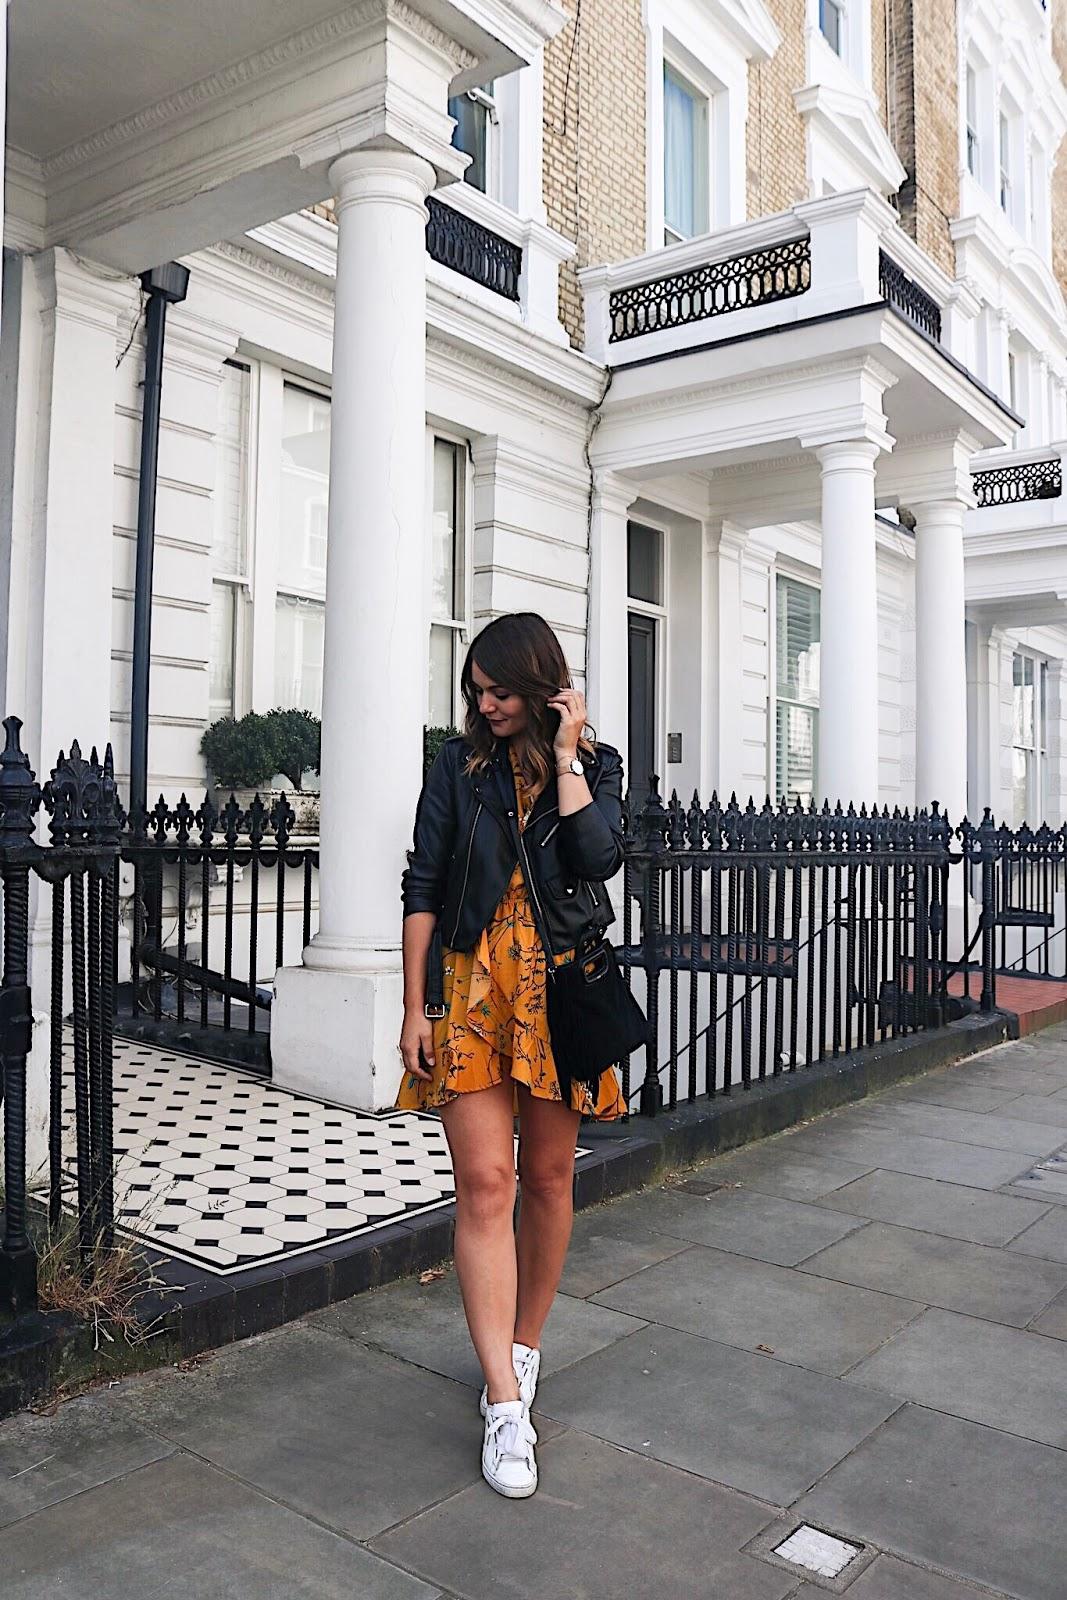 pauline-dress-blog-mode-deco-lifestyle-travel-voyage-europe-londres-angleterre- idees-visites-parcours-touristique-instagram-instagrammable-lieux